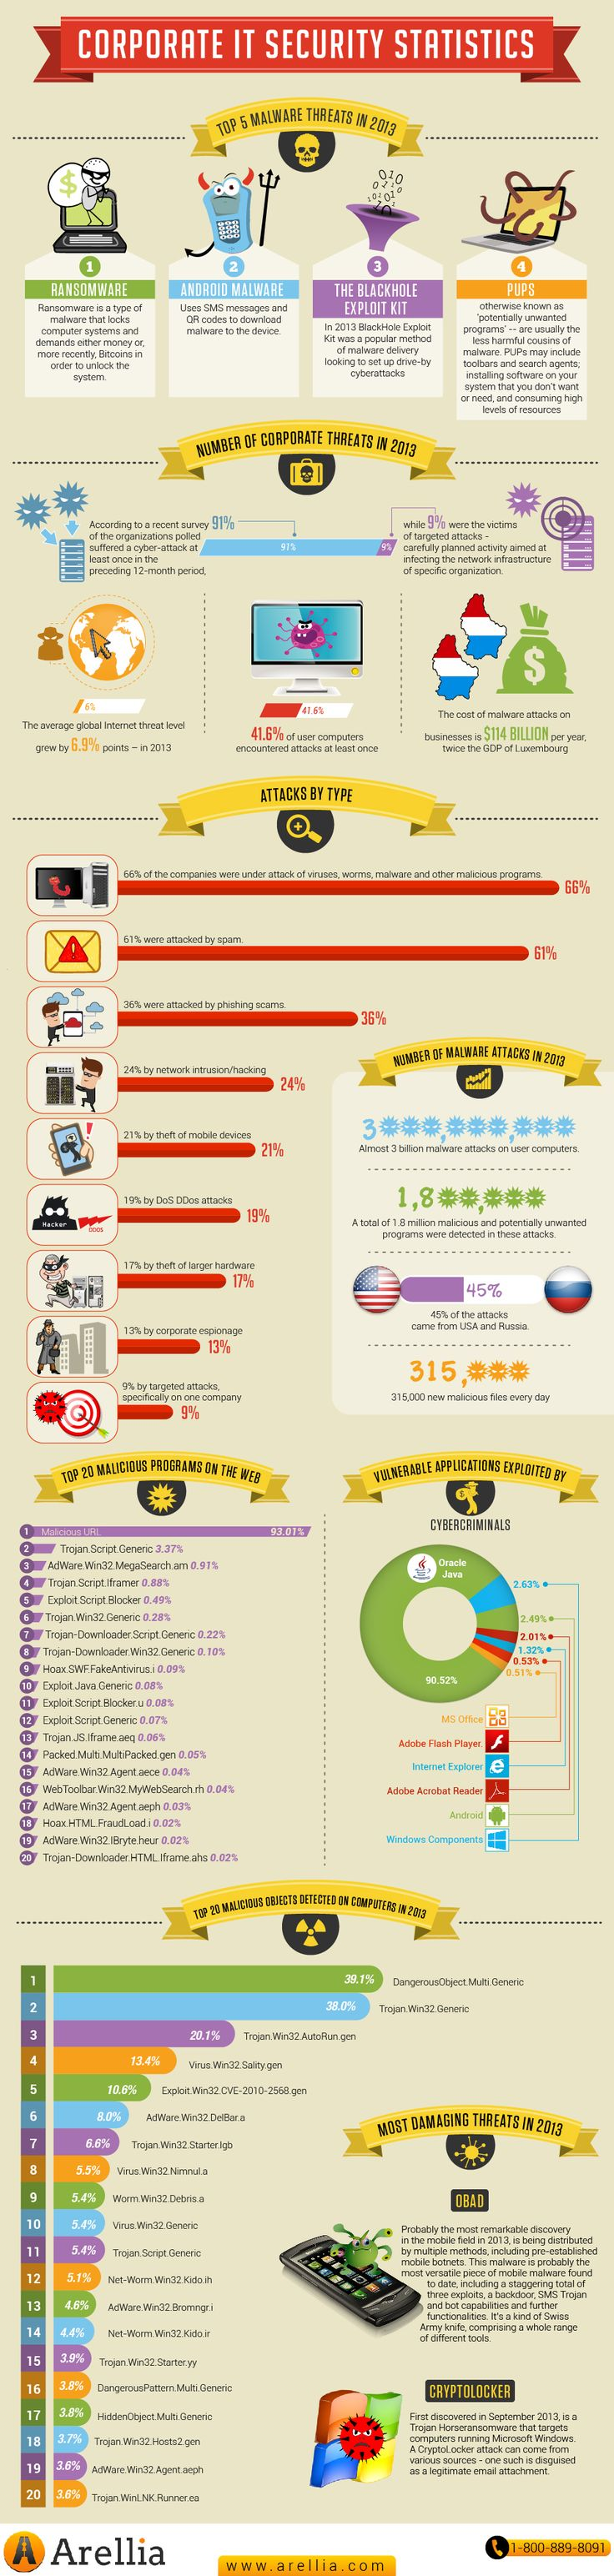 Corporate security threats #Infographic // Seguridad empresarial online #Infografía